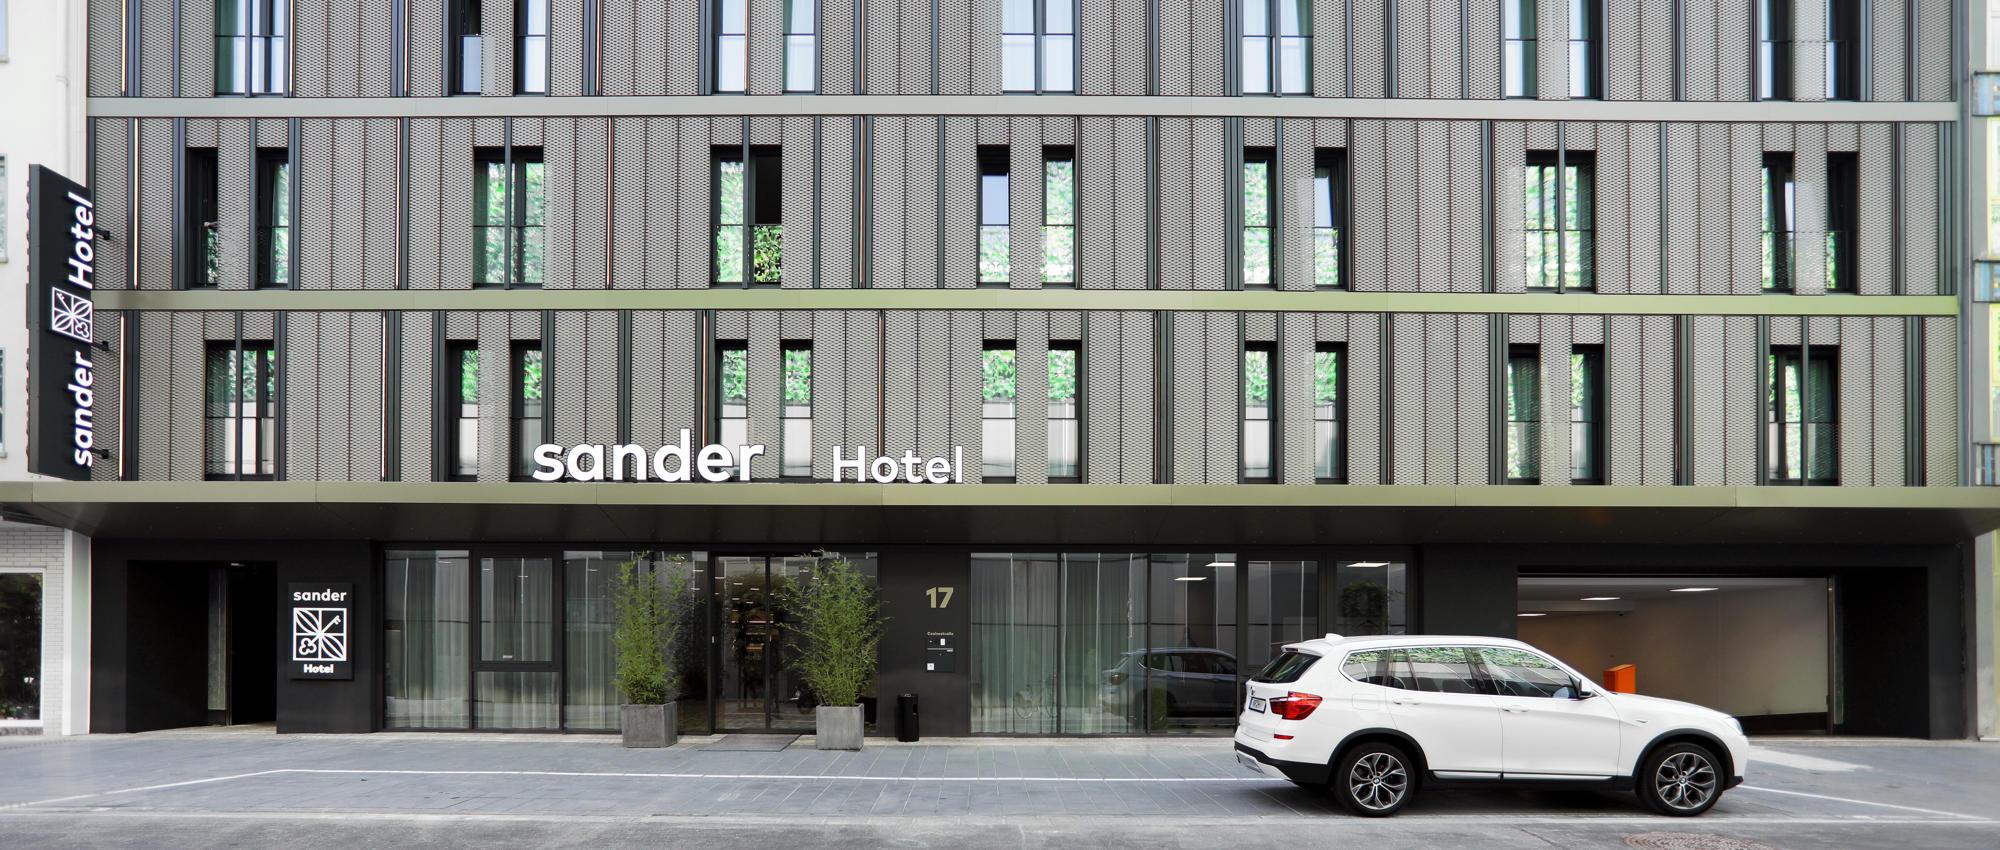 hotel-02b.jpg